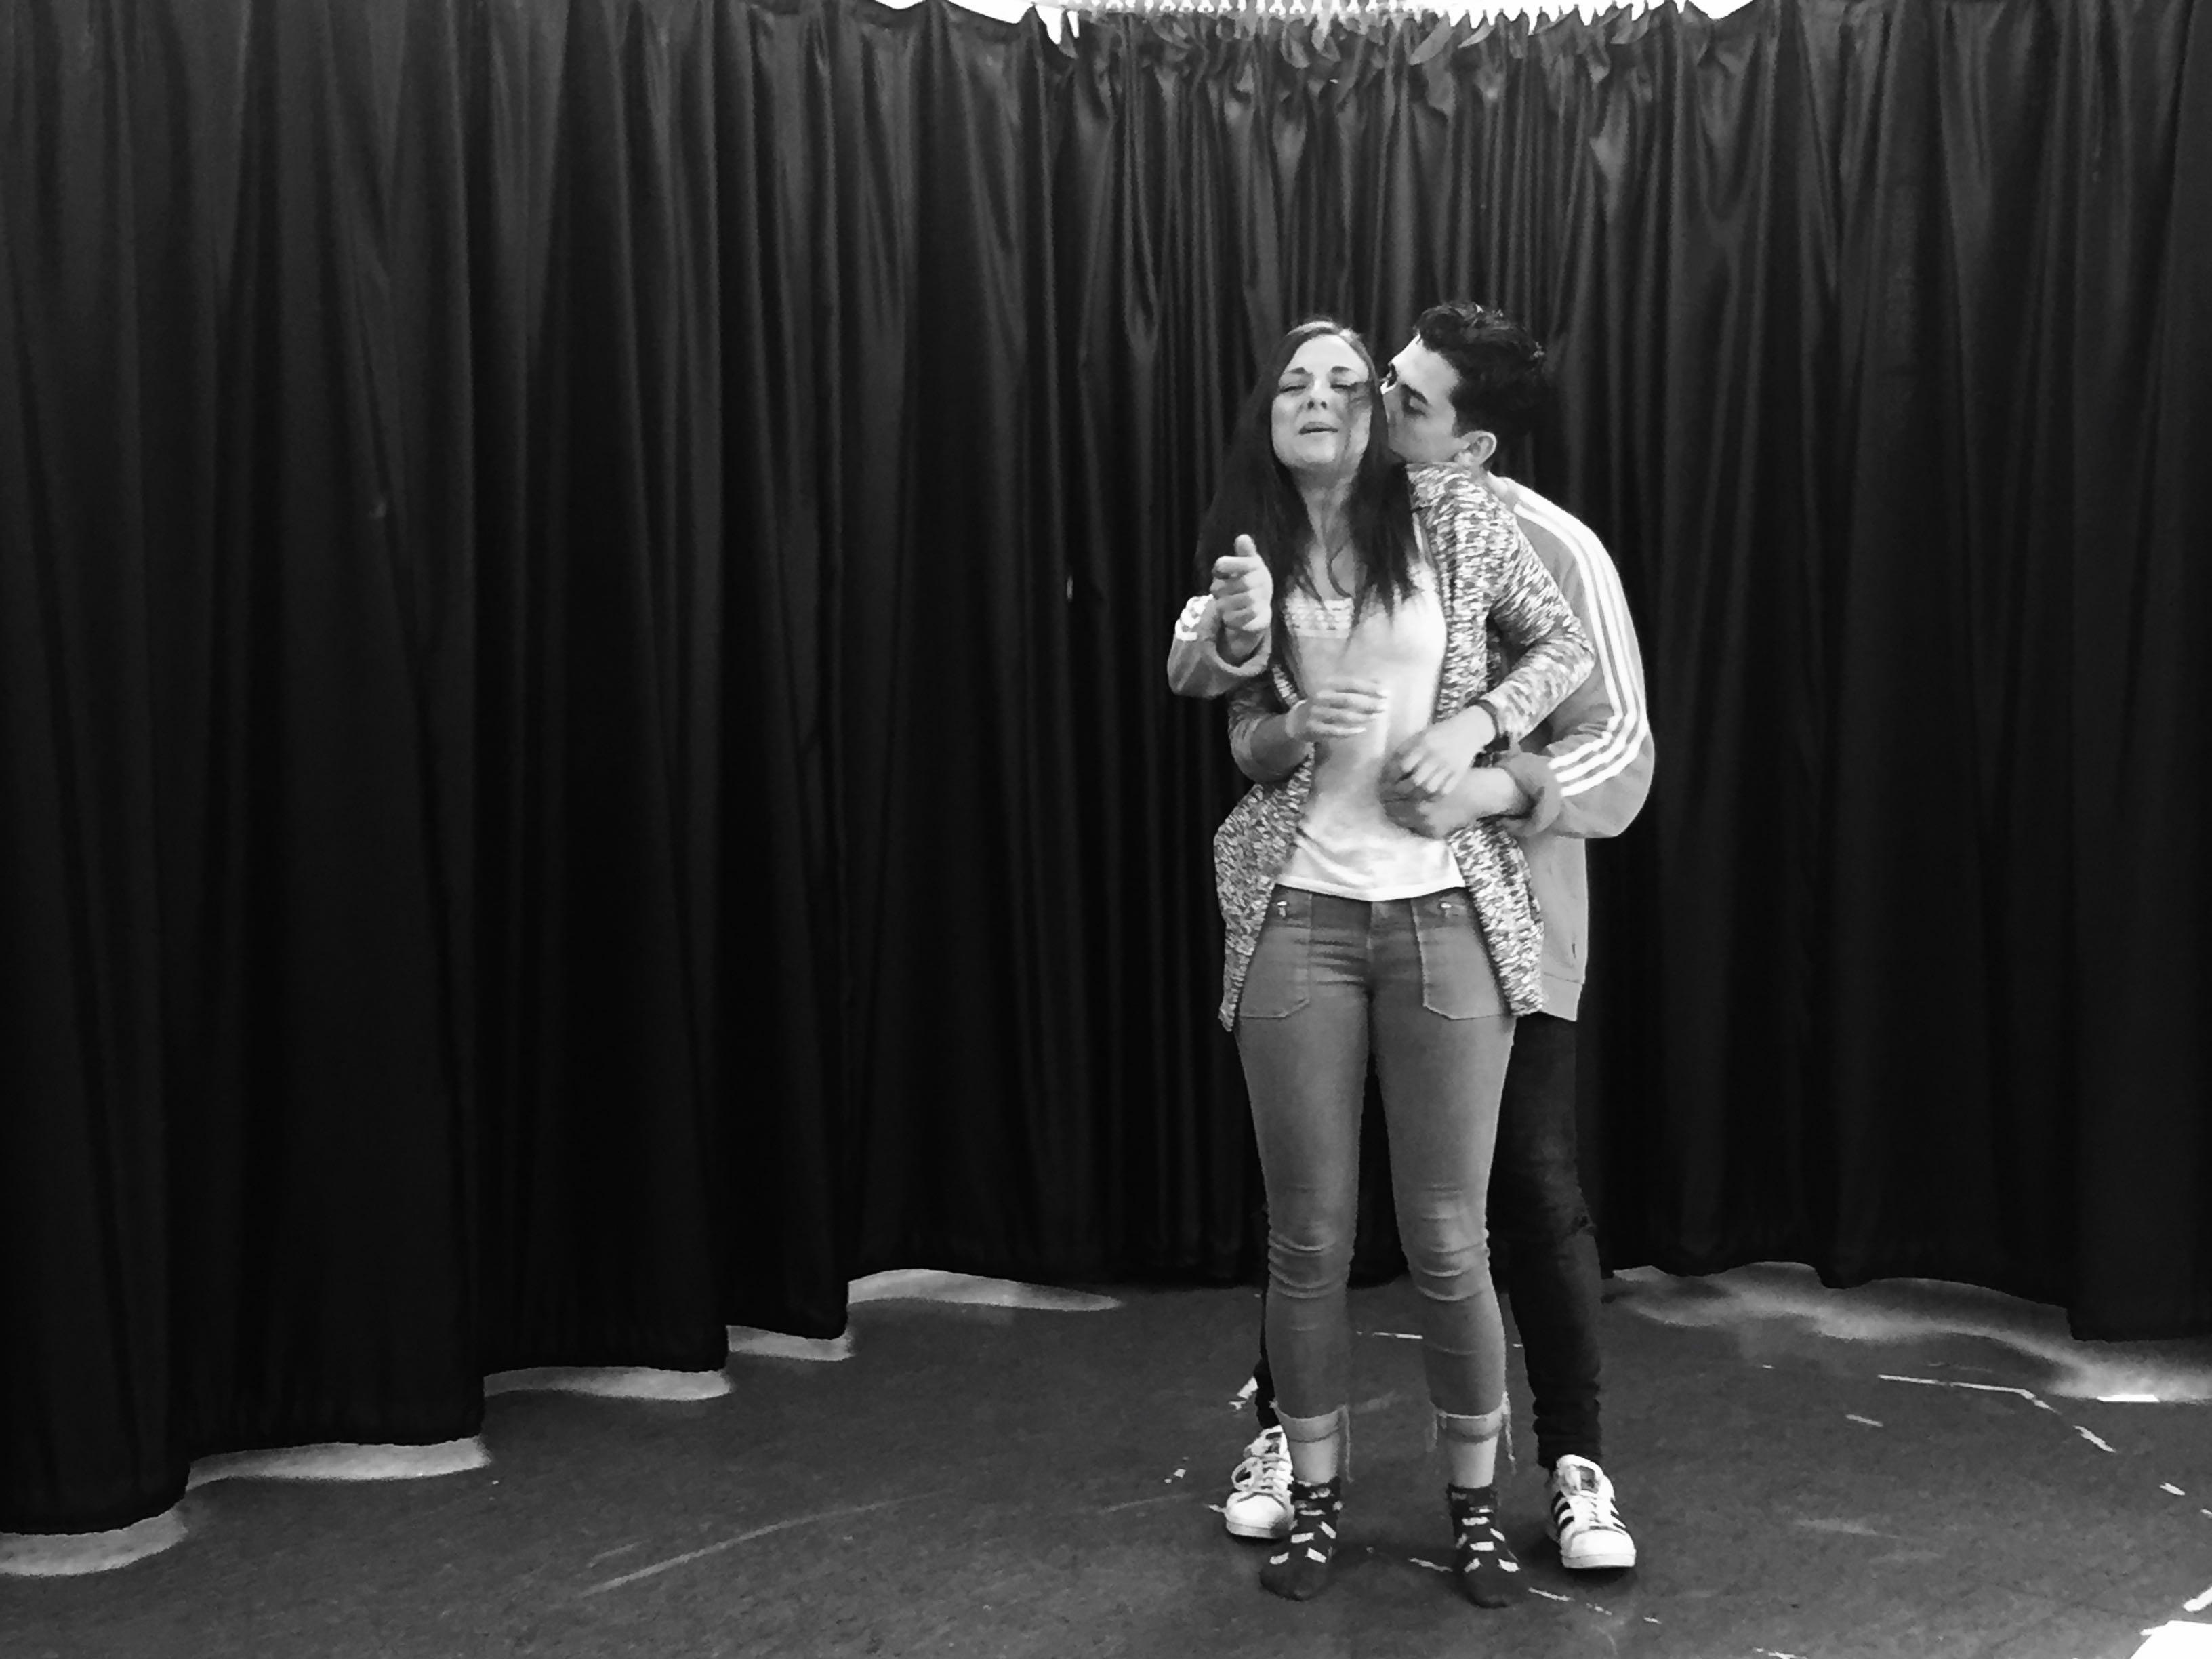 Jordan & Anna's dramatic moment